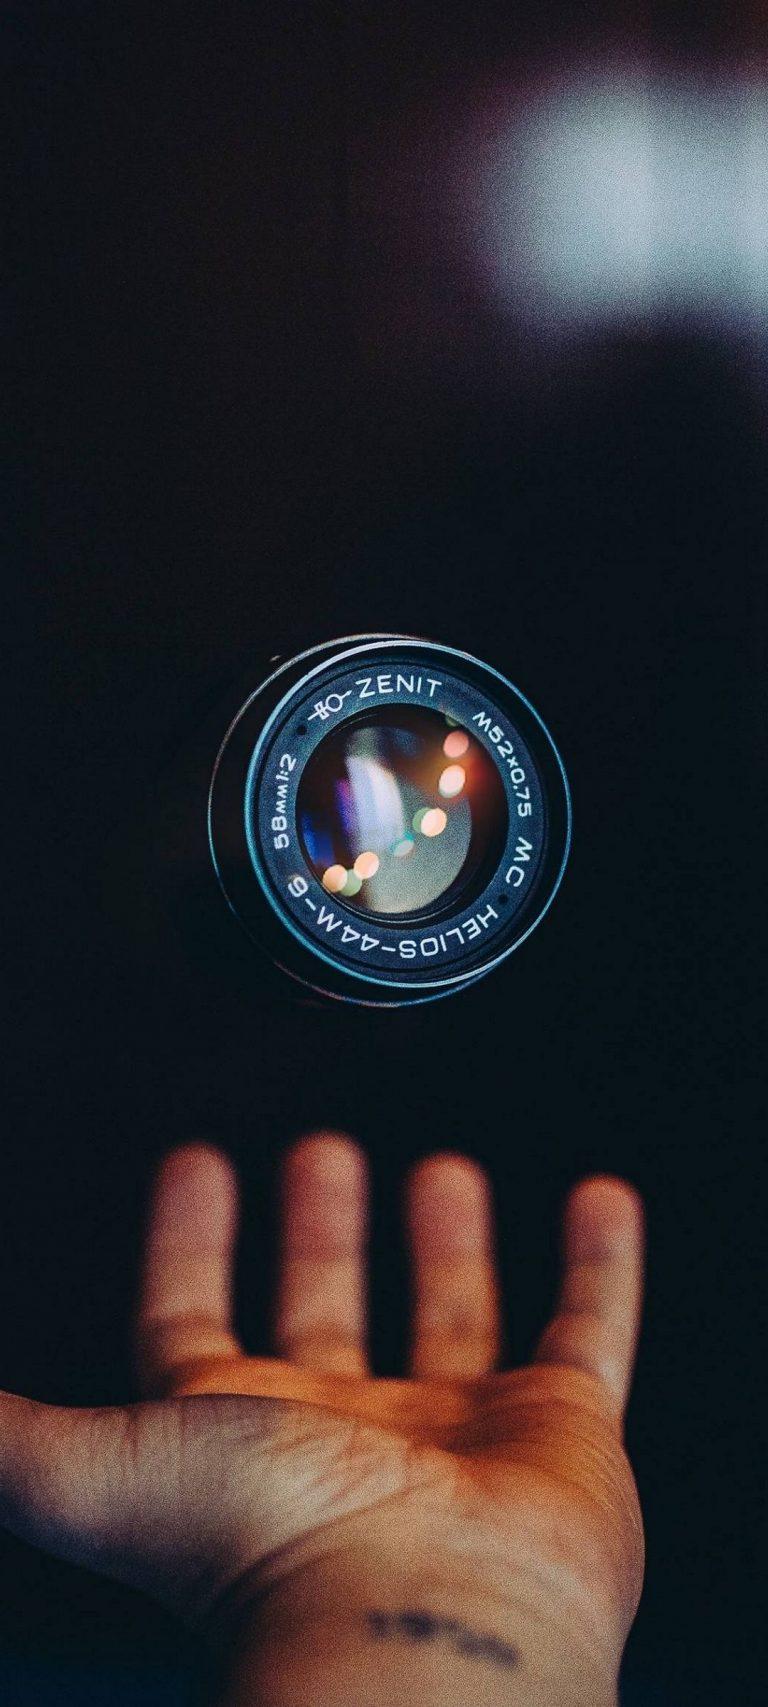 Lens Hand Camera Technology 1080x2400 768x1707